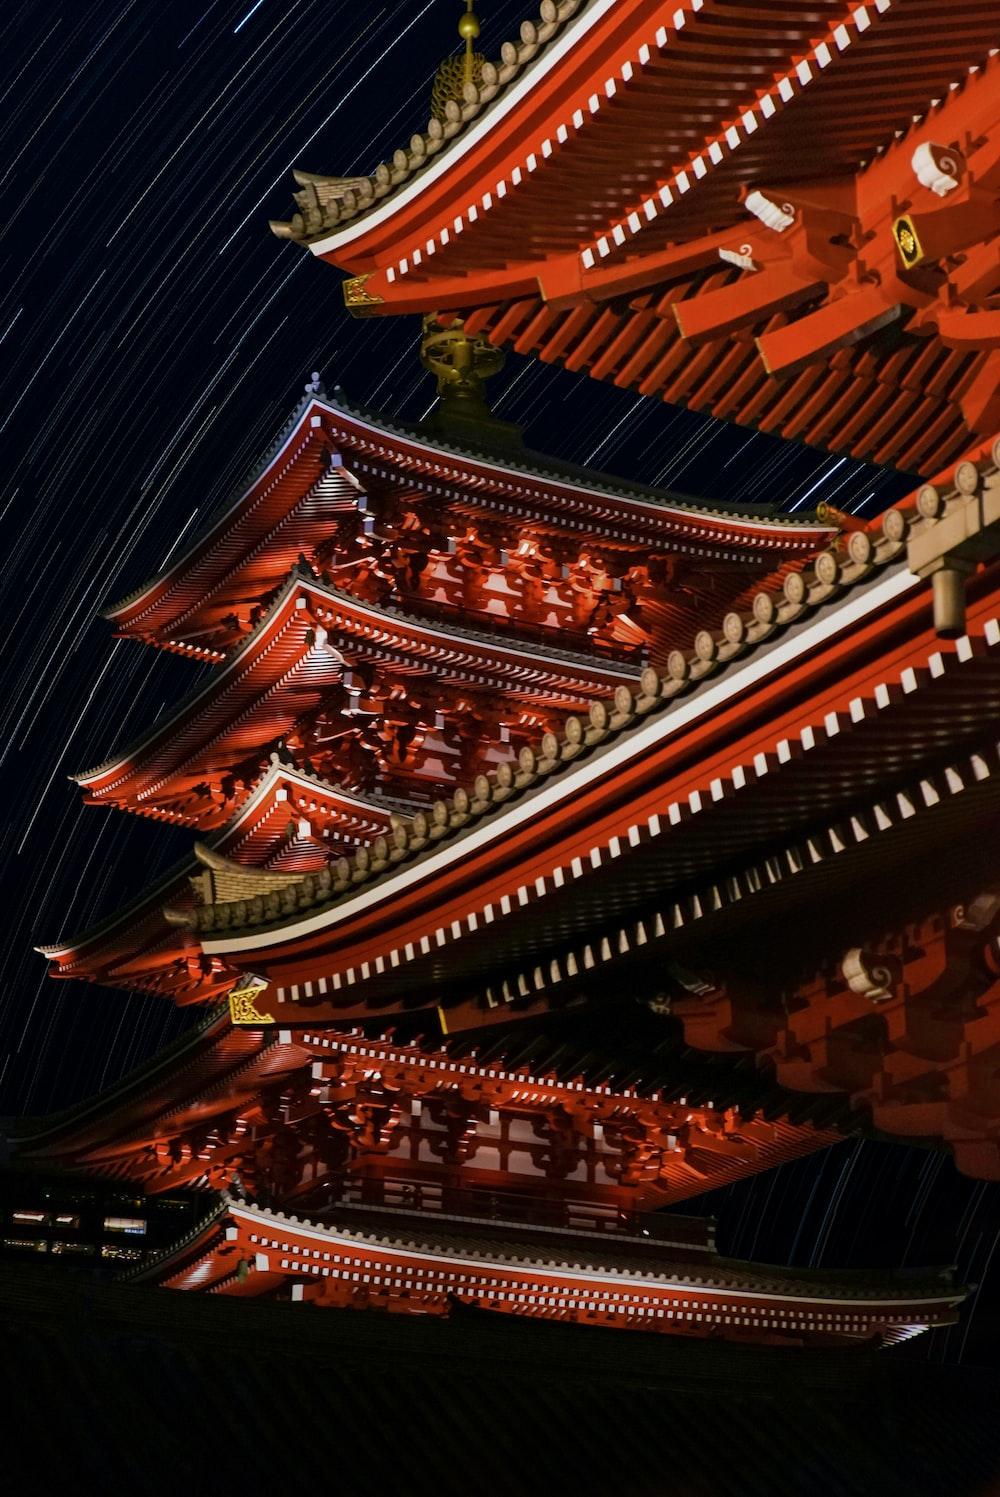 close-up photography of pagoda